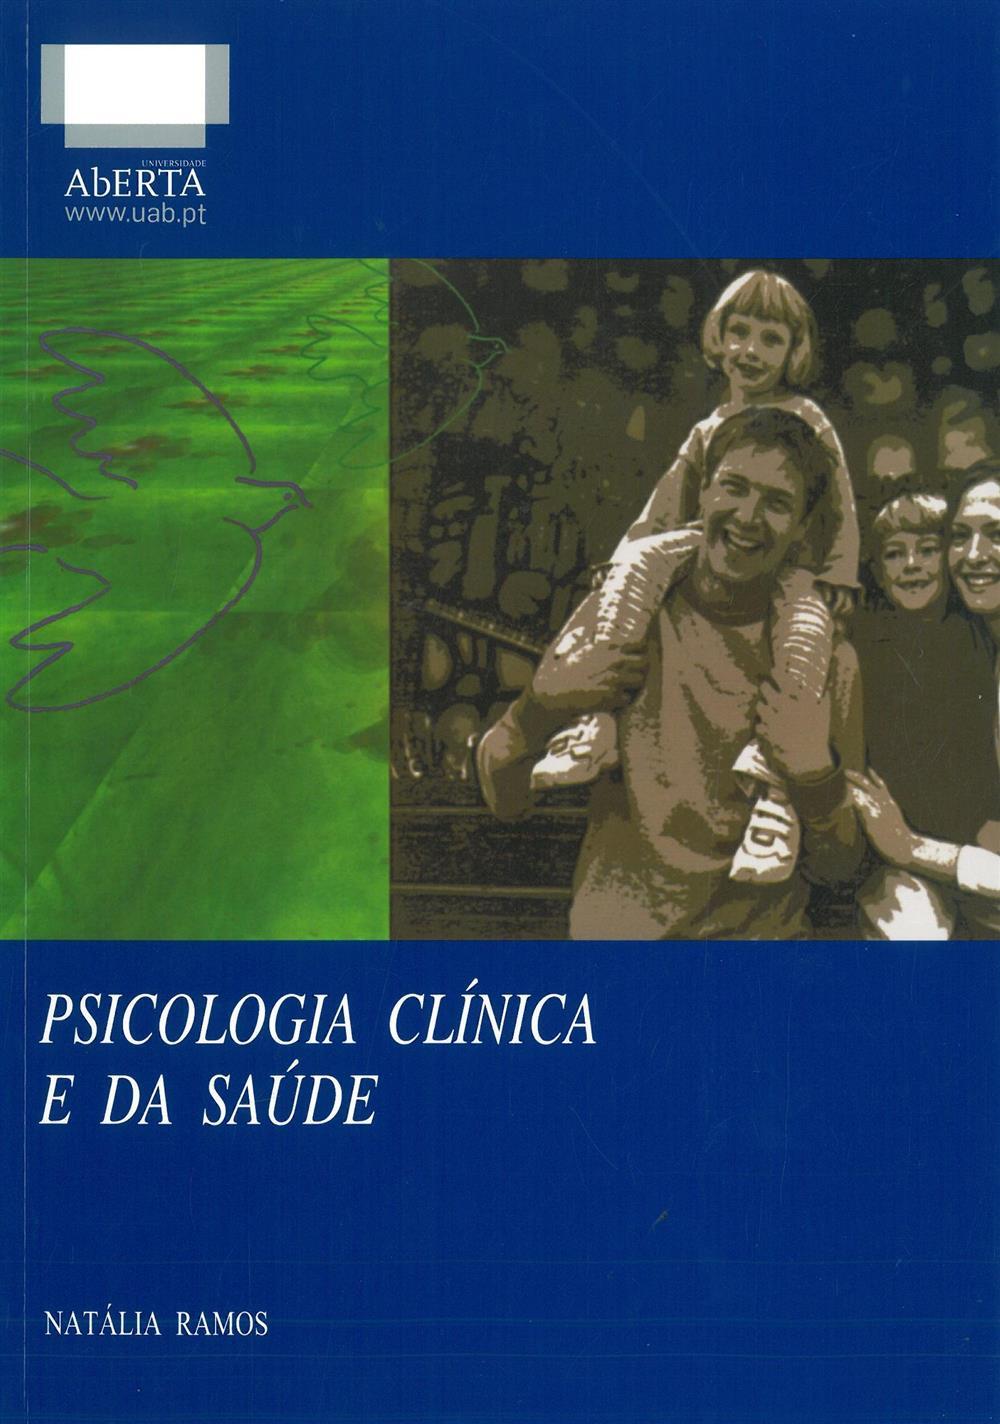 Psicologia clínica e da saúde_.jpg